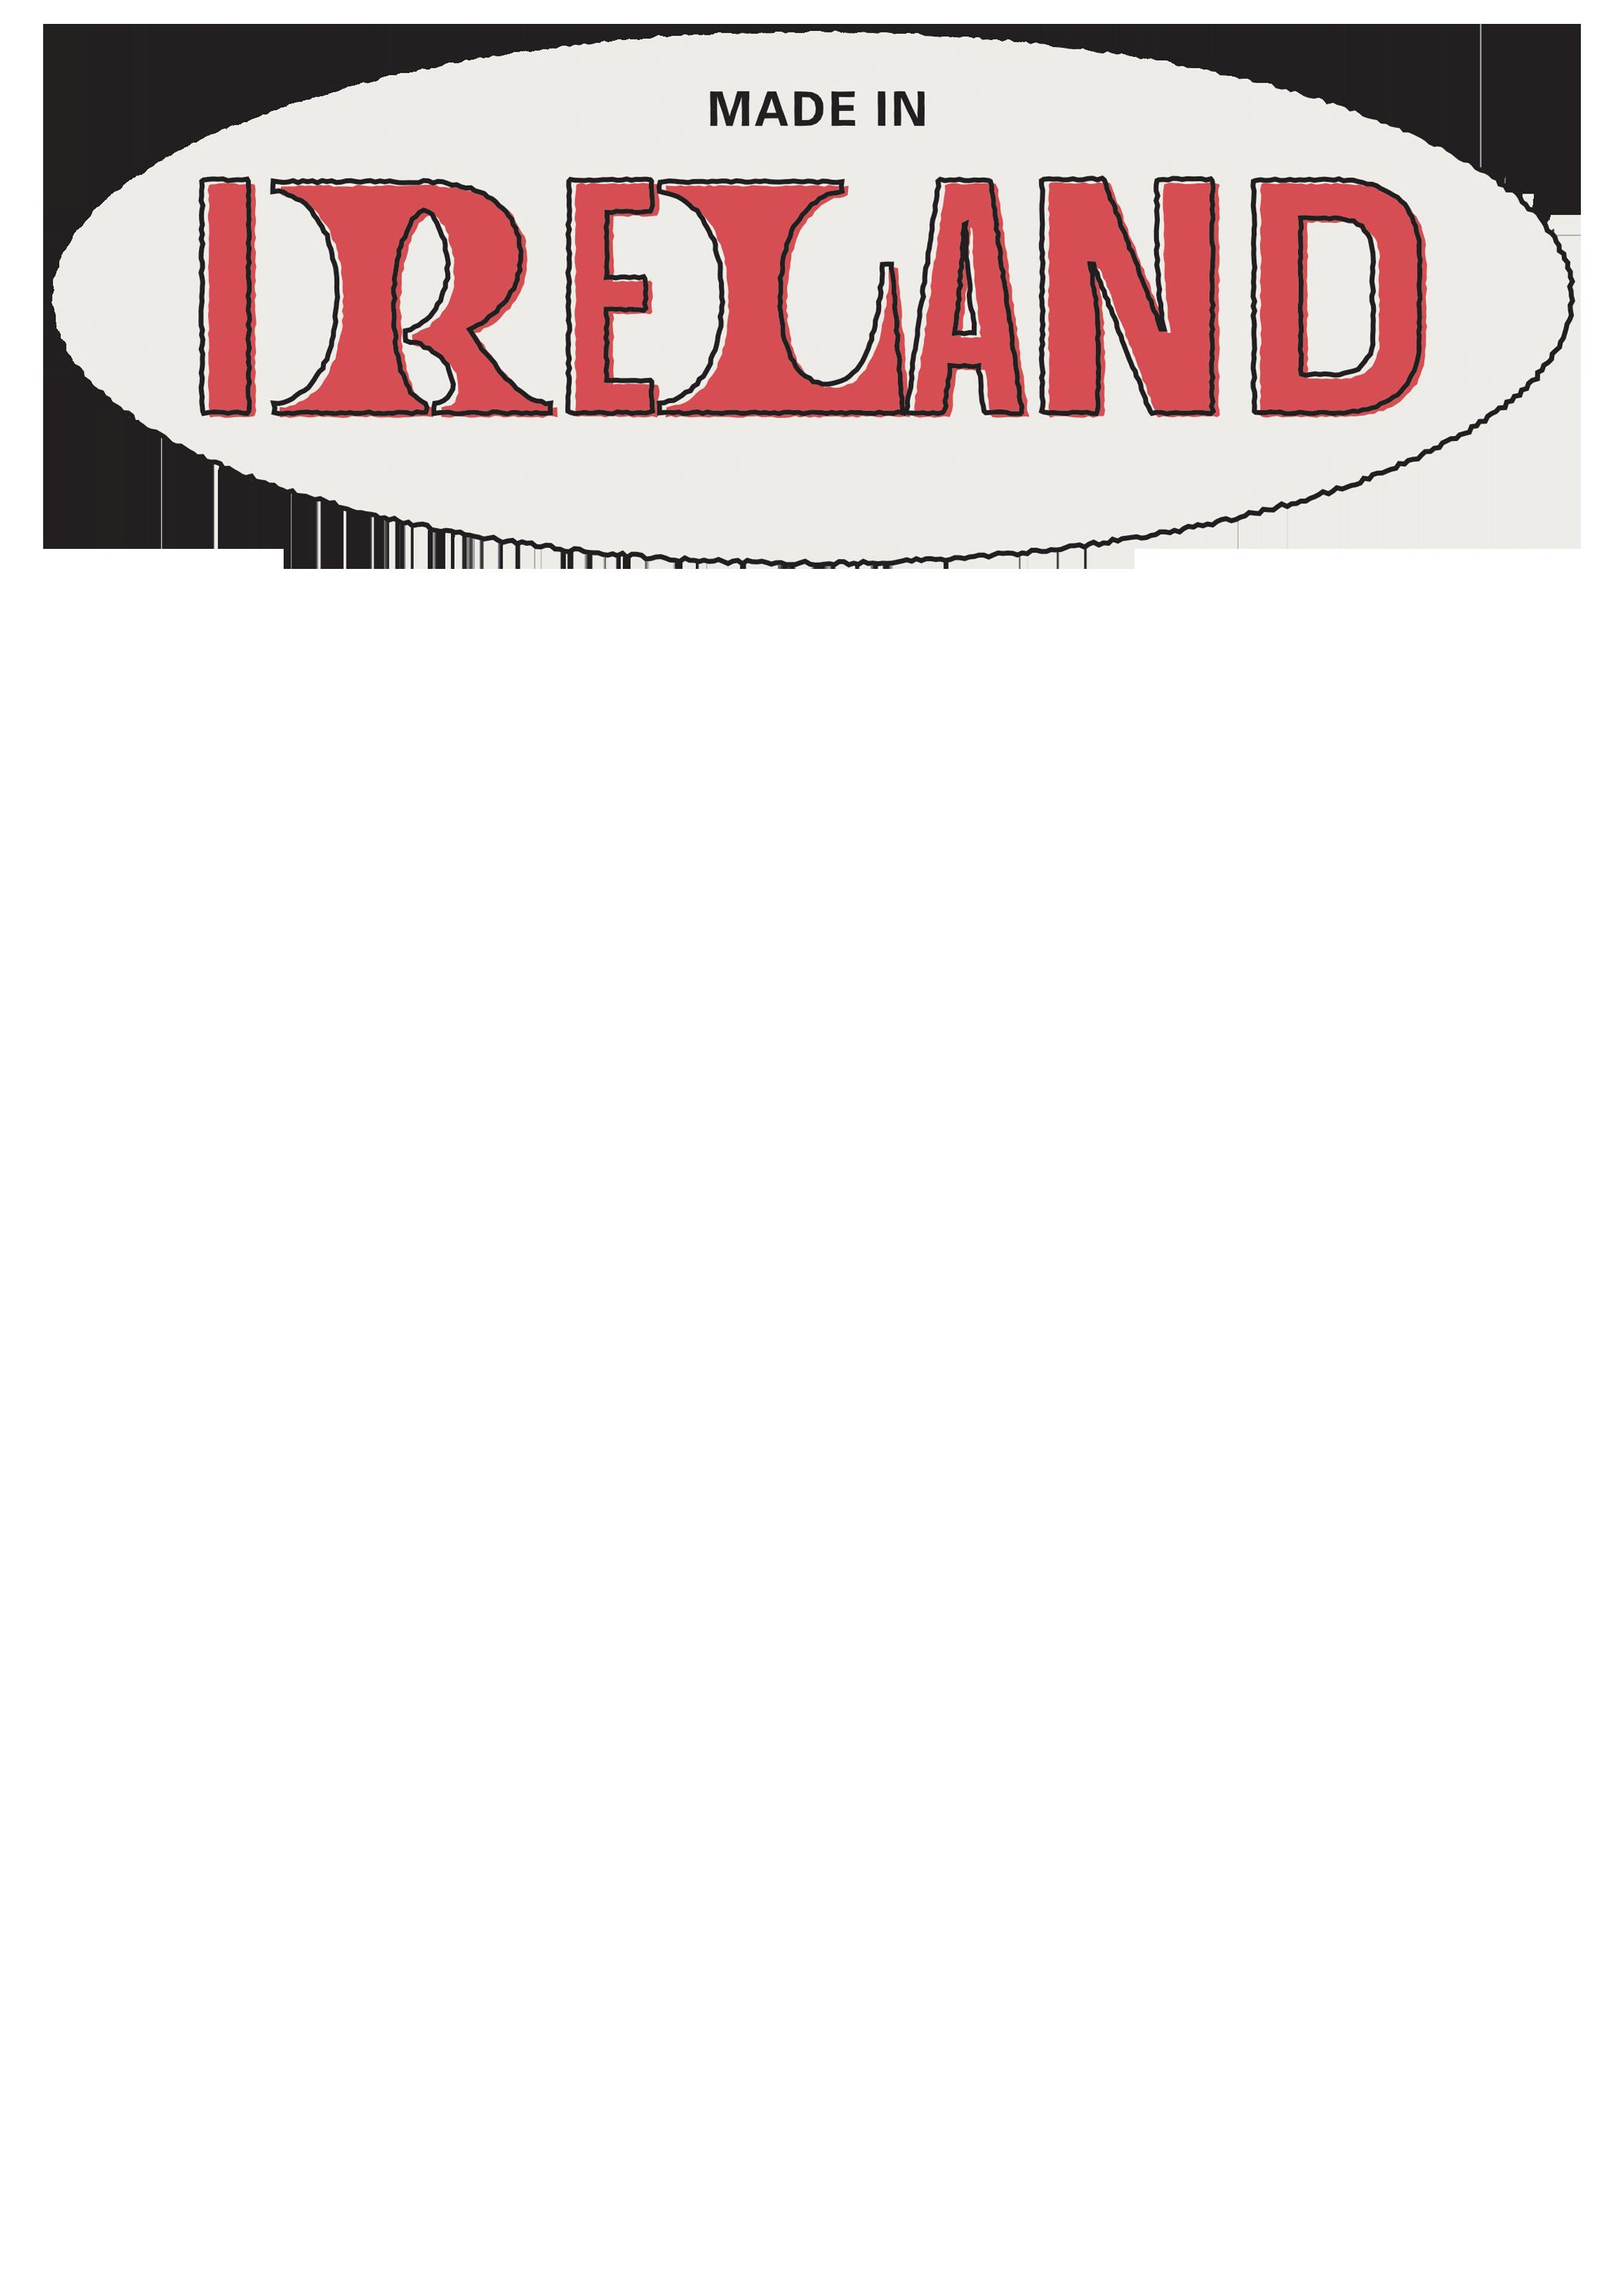 Ireland Stamp.png